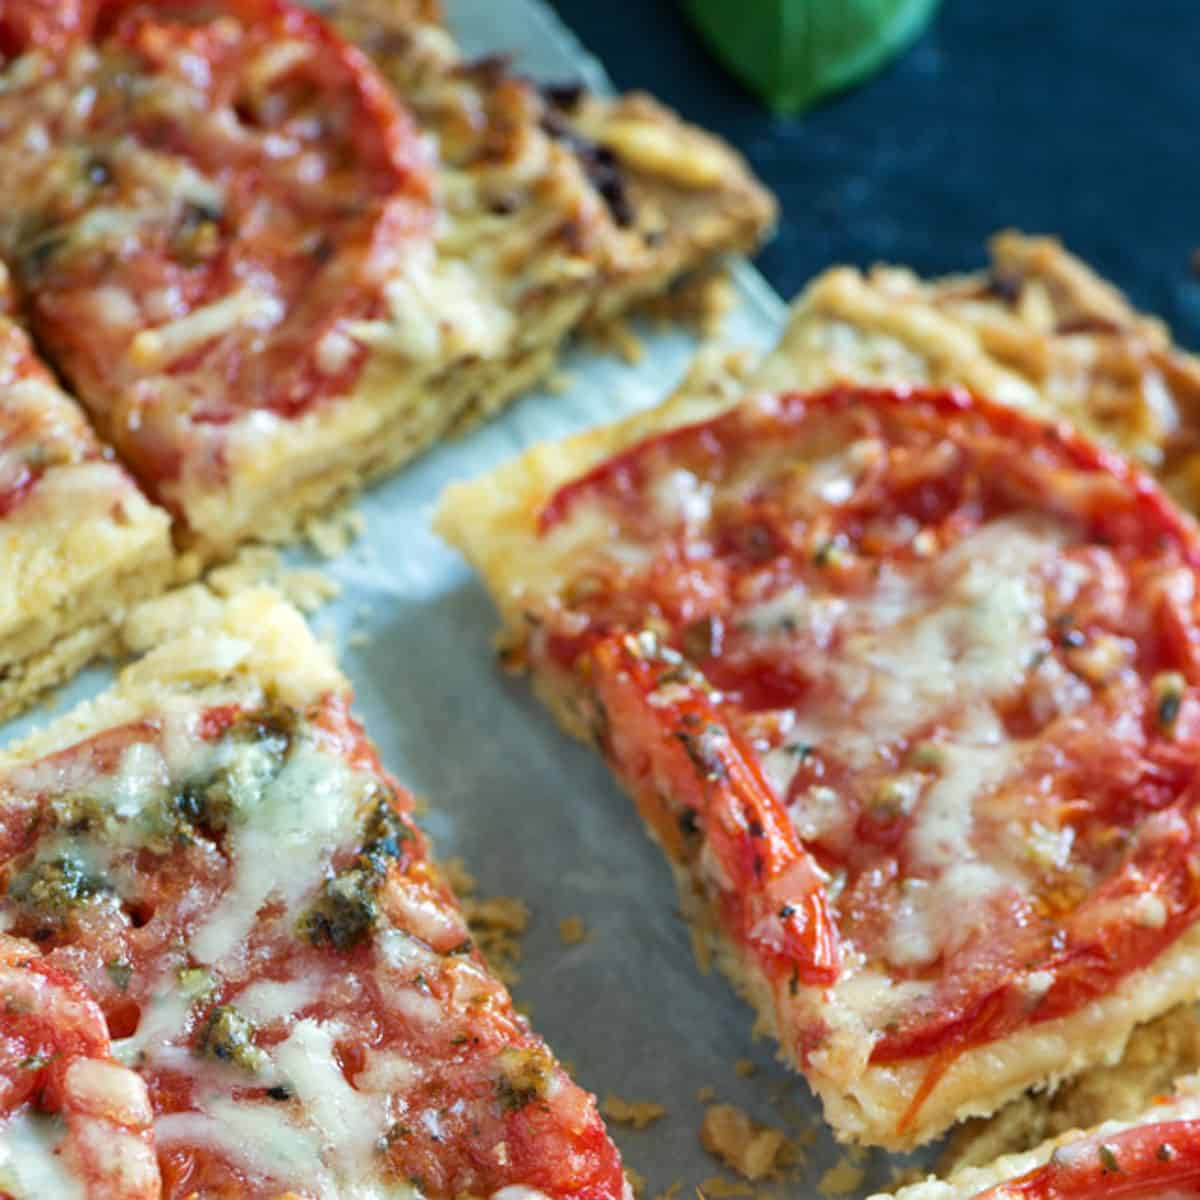 Slices of heirloom tomato tart